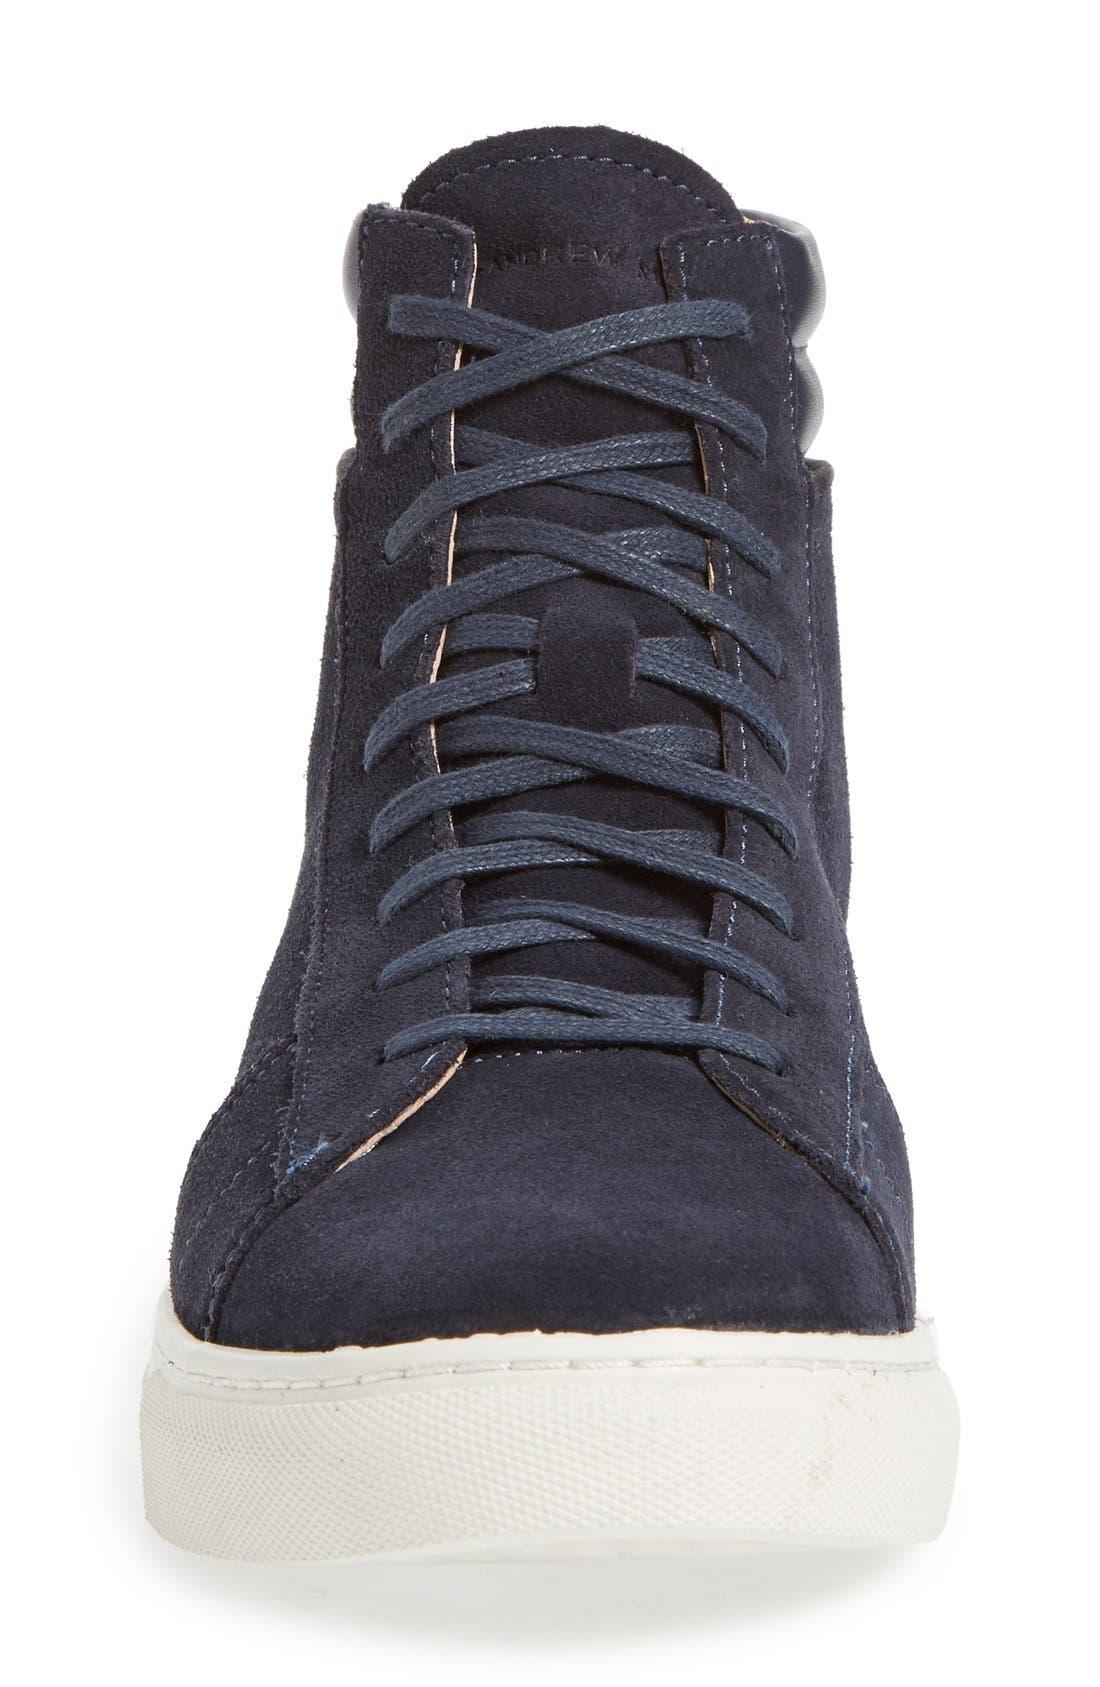 Alternate Image 3  - Andrew Marc 'Remsen' High Top Sneaker (Men)